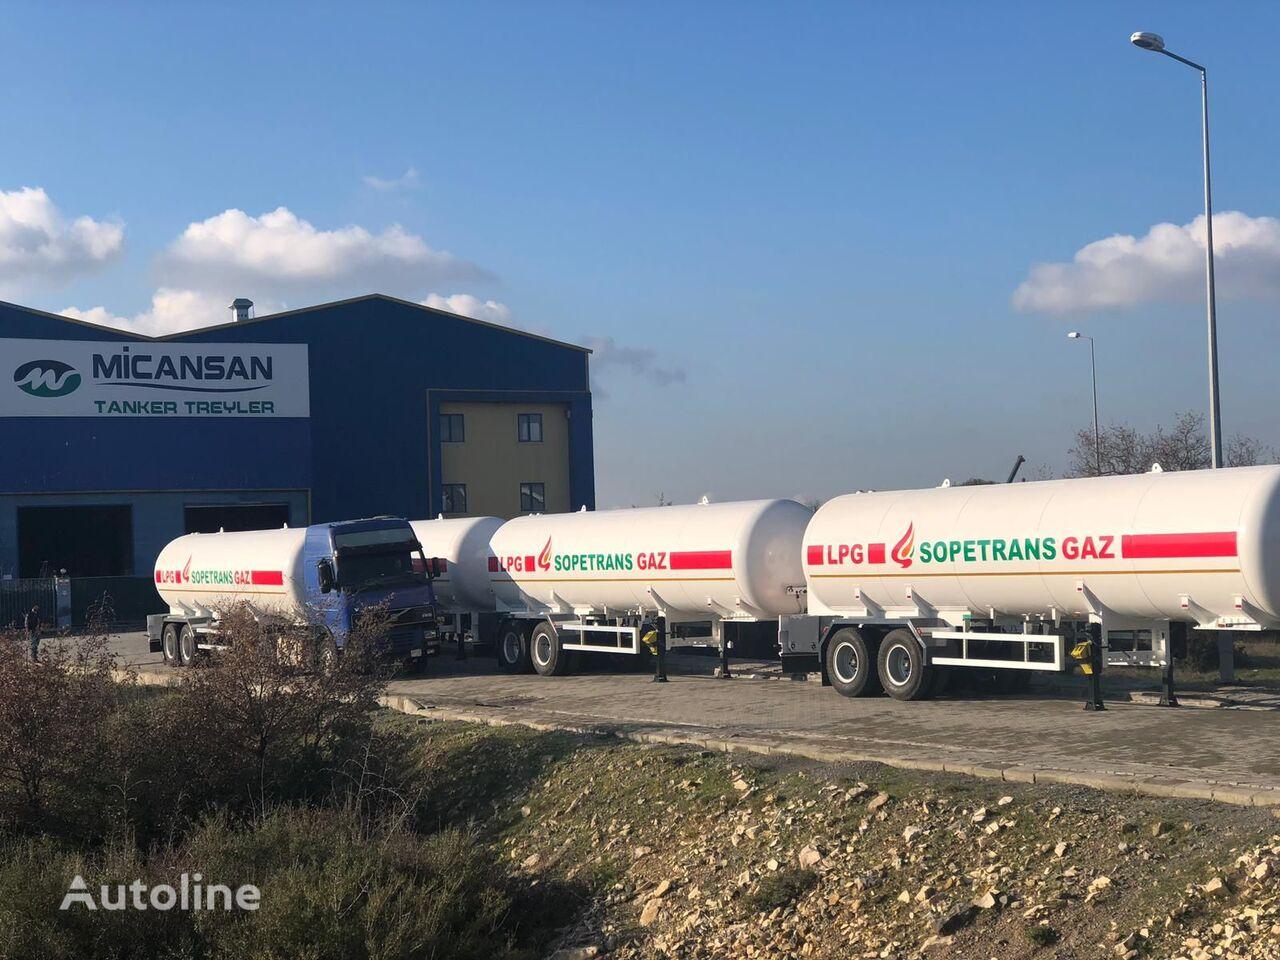 new Micansan gas tank trailer